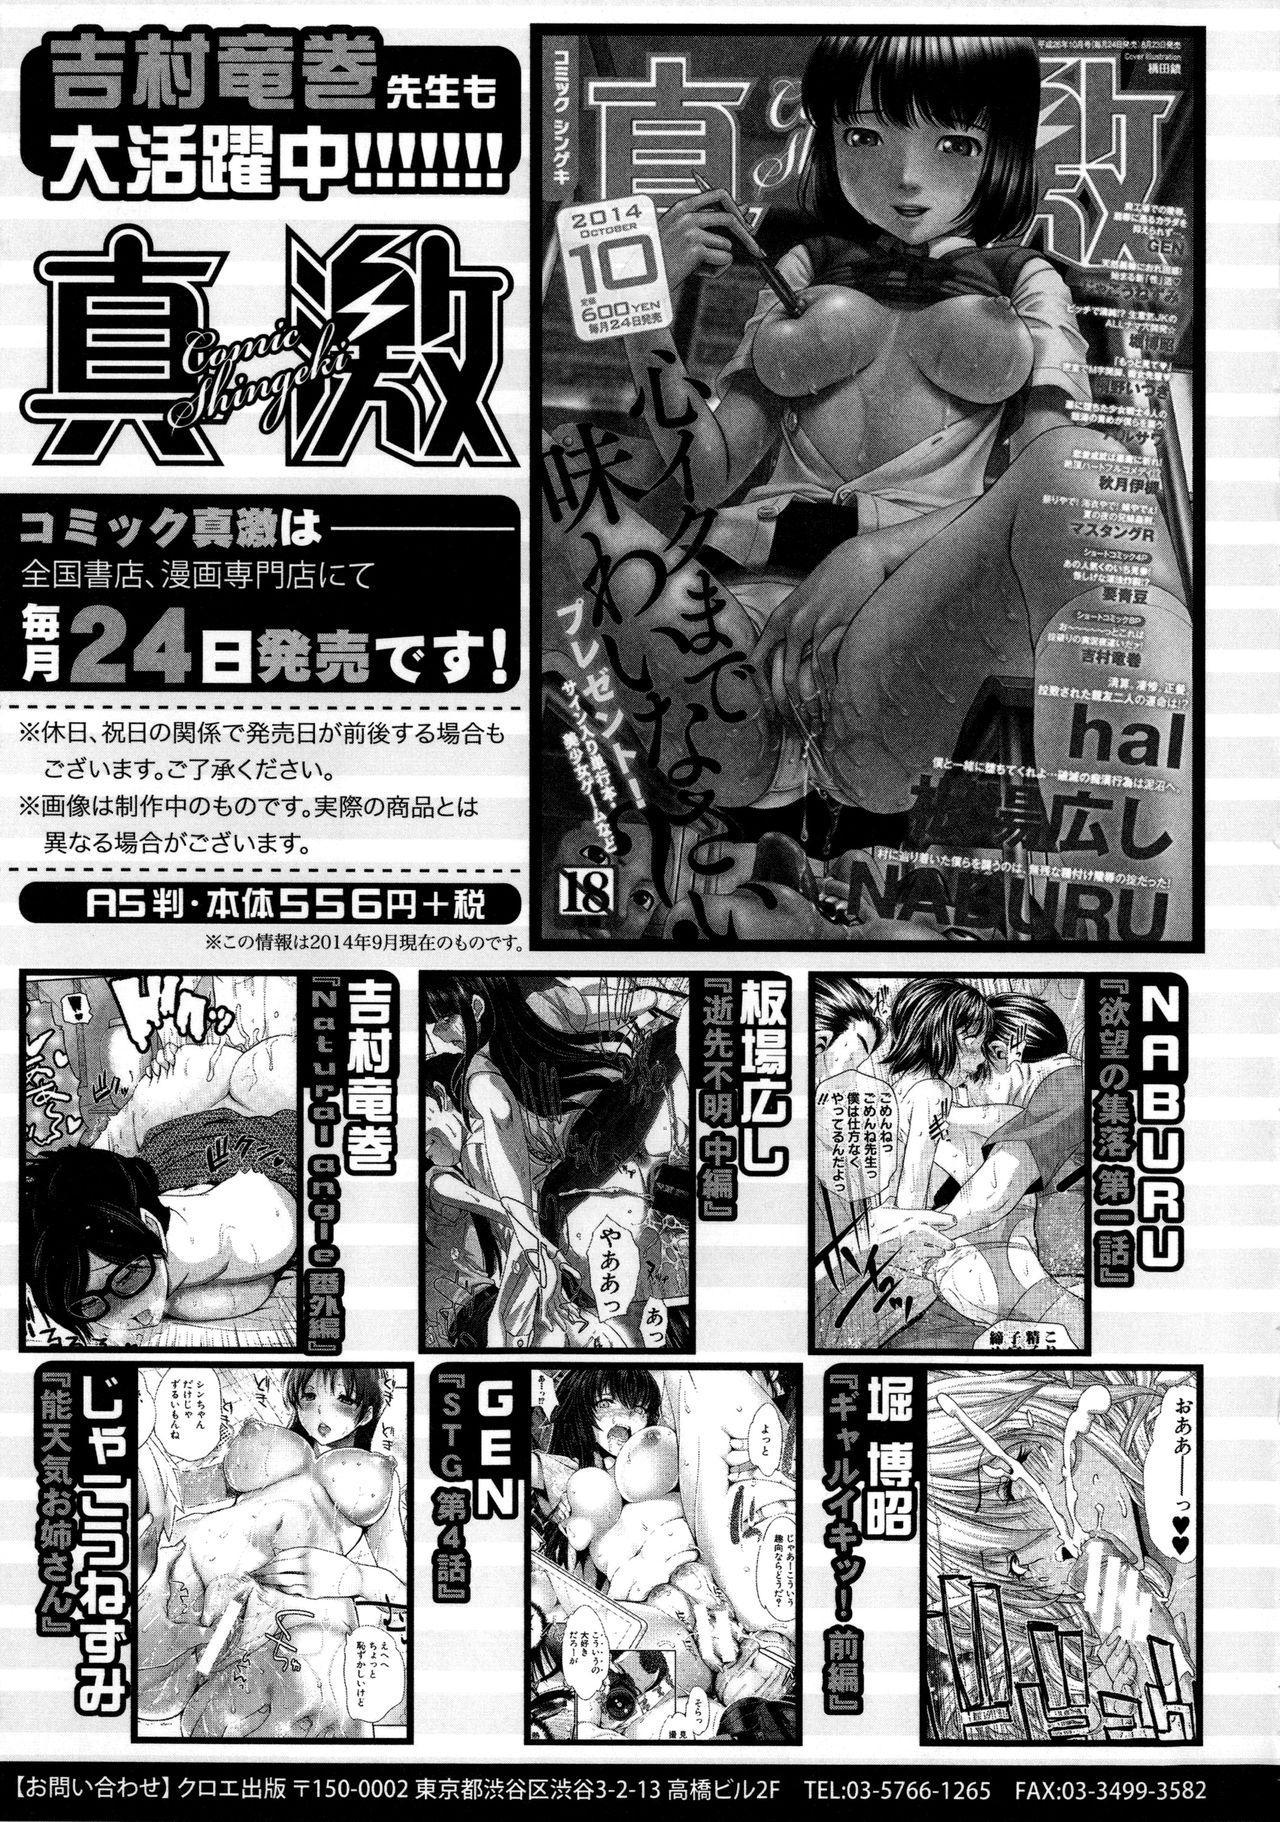 [Yoshimura Tatsumaki] Monzetsu Taigatame ~Count 3 de Ikasete Ageru~ | Faint in Agony Bodylock ~I'll make you cum on the count of 3~ [English] [Brolen] 230